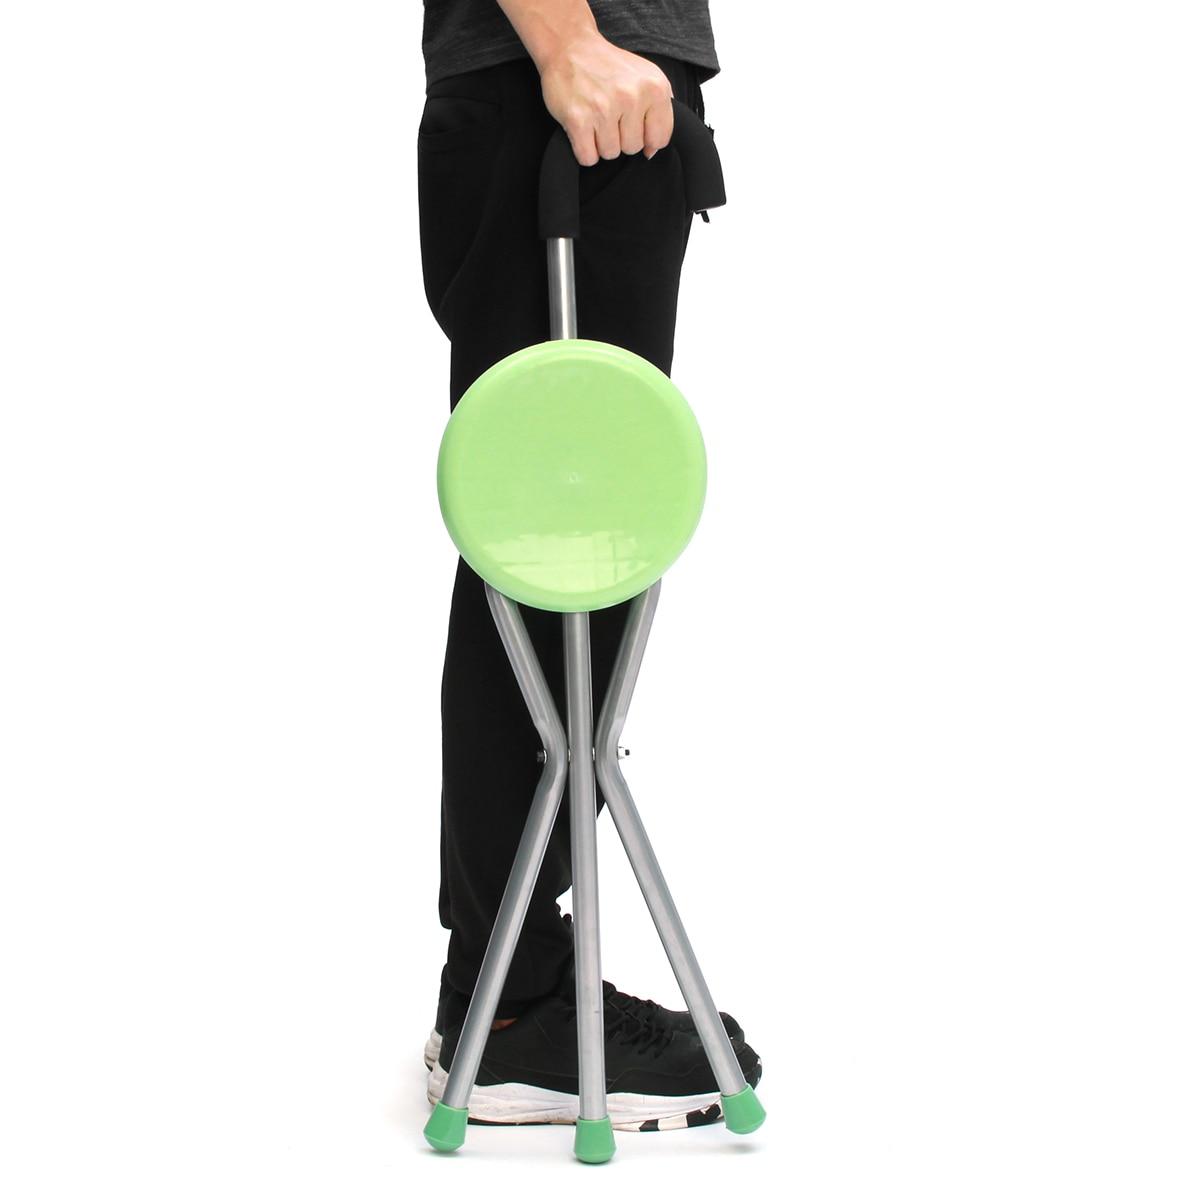 Camping Folding Aluminium Tripod Cane Walking Stick Seat Portable Stool Chair Plastic Seat Non Slip Max Load Bearing 130kg folding cane chair walking stick with tripod stool